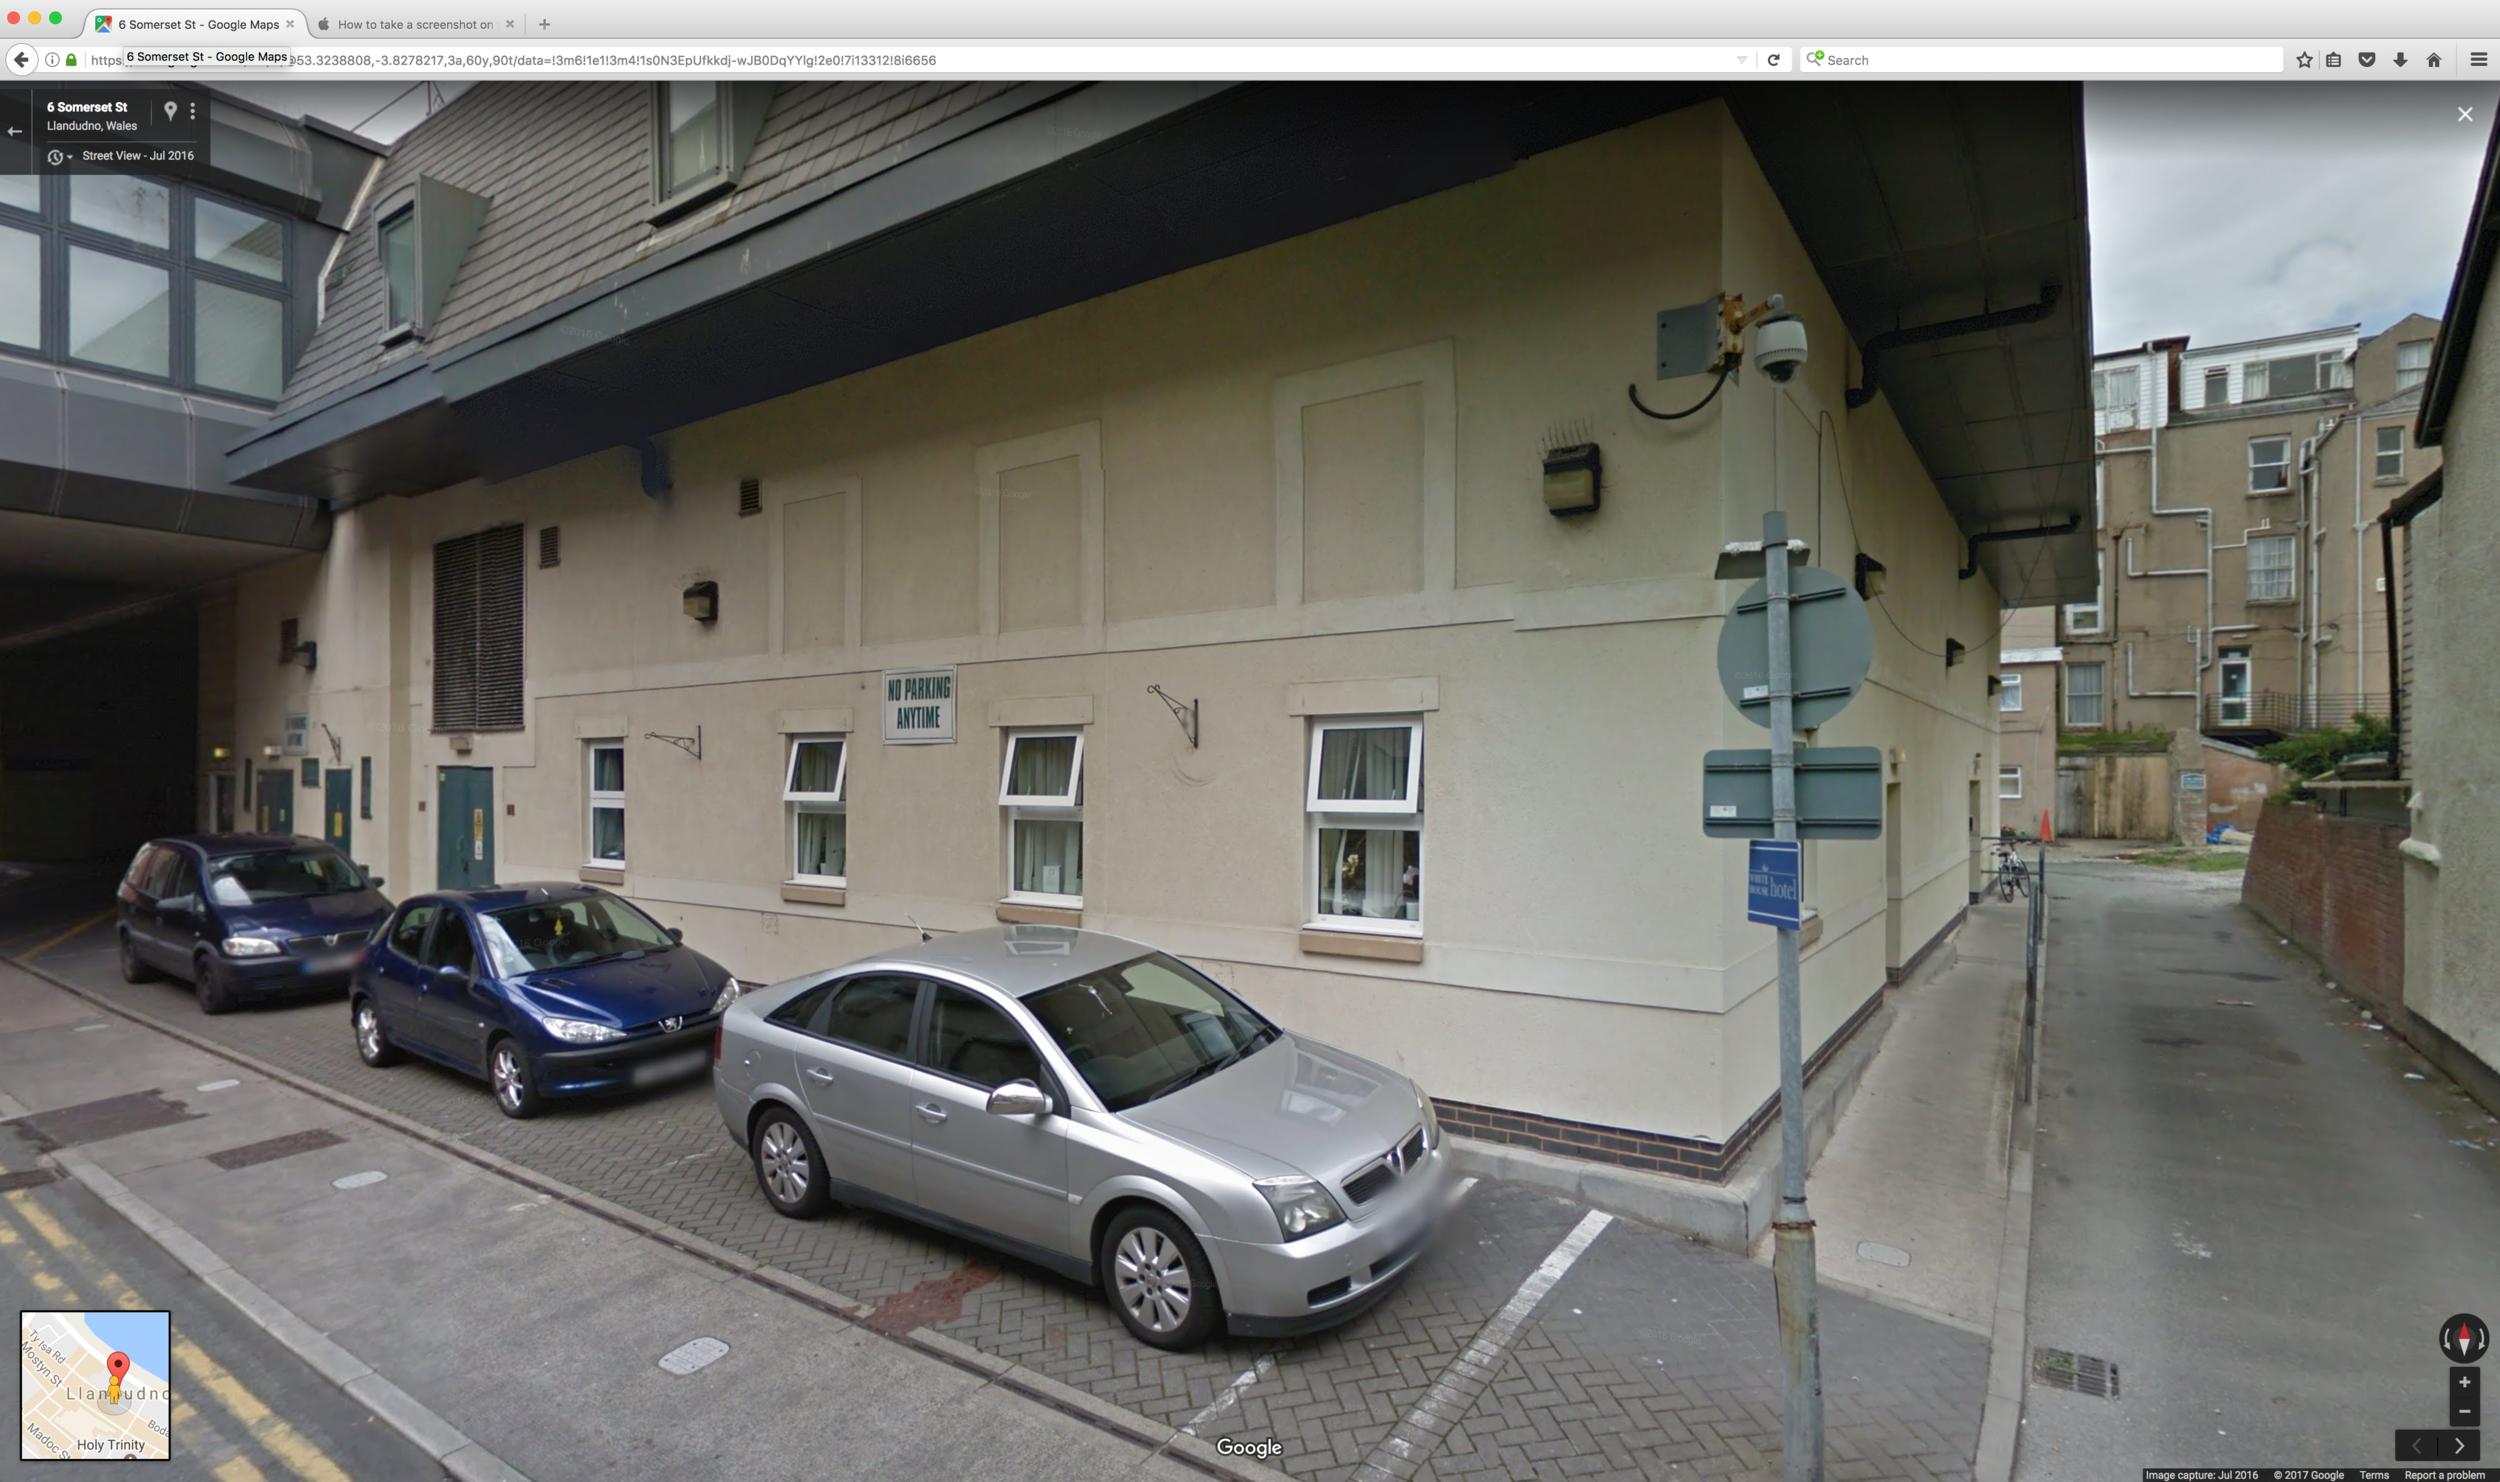 6 Somerset Street, the centre of Llandudno according to Google